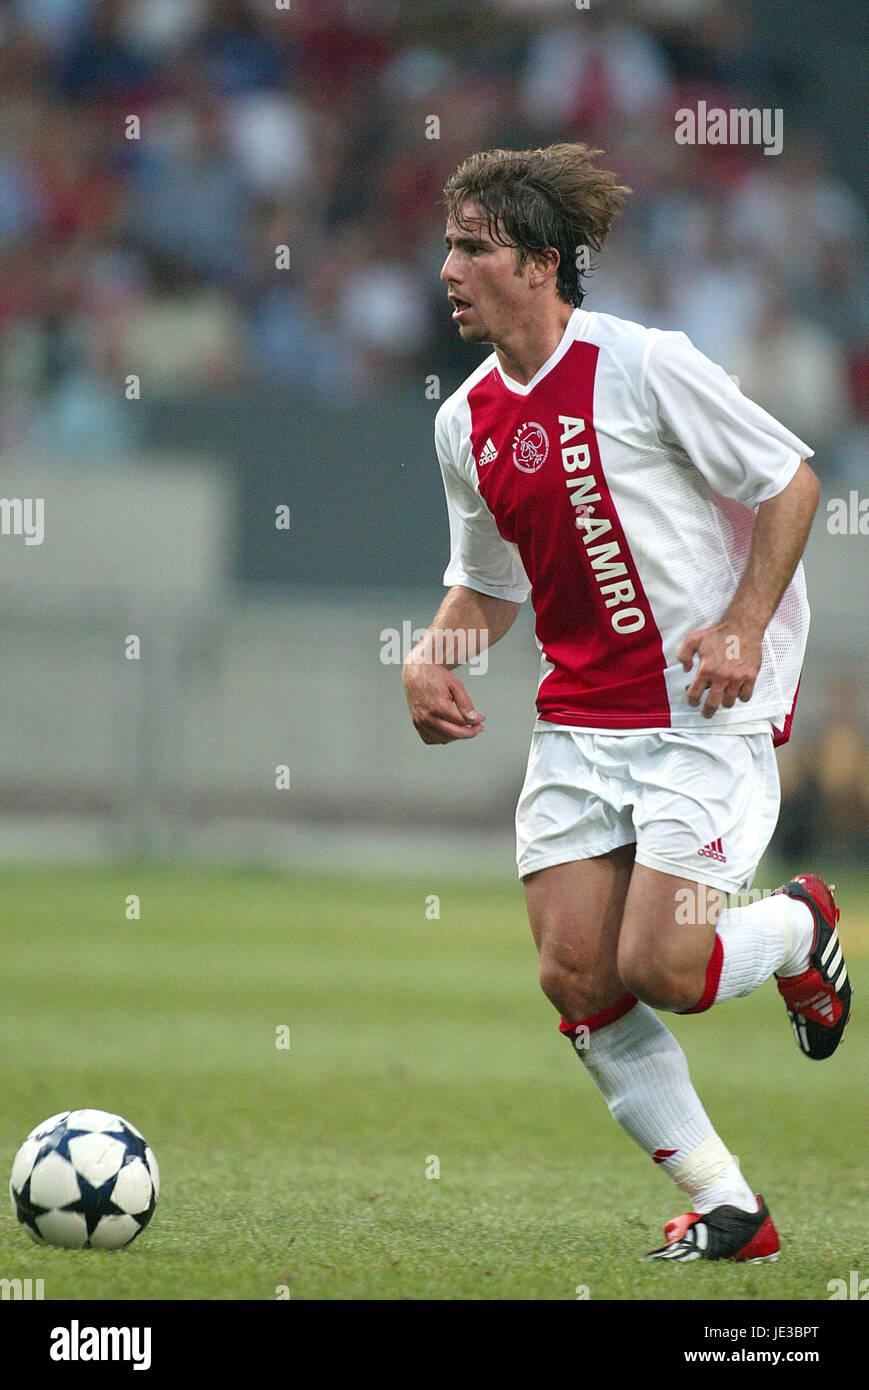 MAXWELL AJAX AMSTERDAM ARENA AMSTERDAM HOLLAND 03 August 2003 - Stock Image